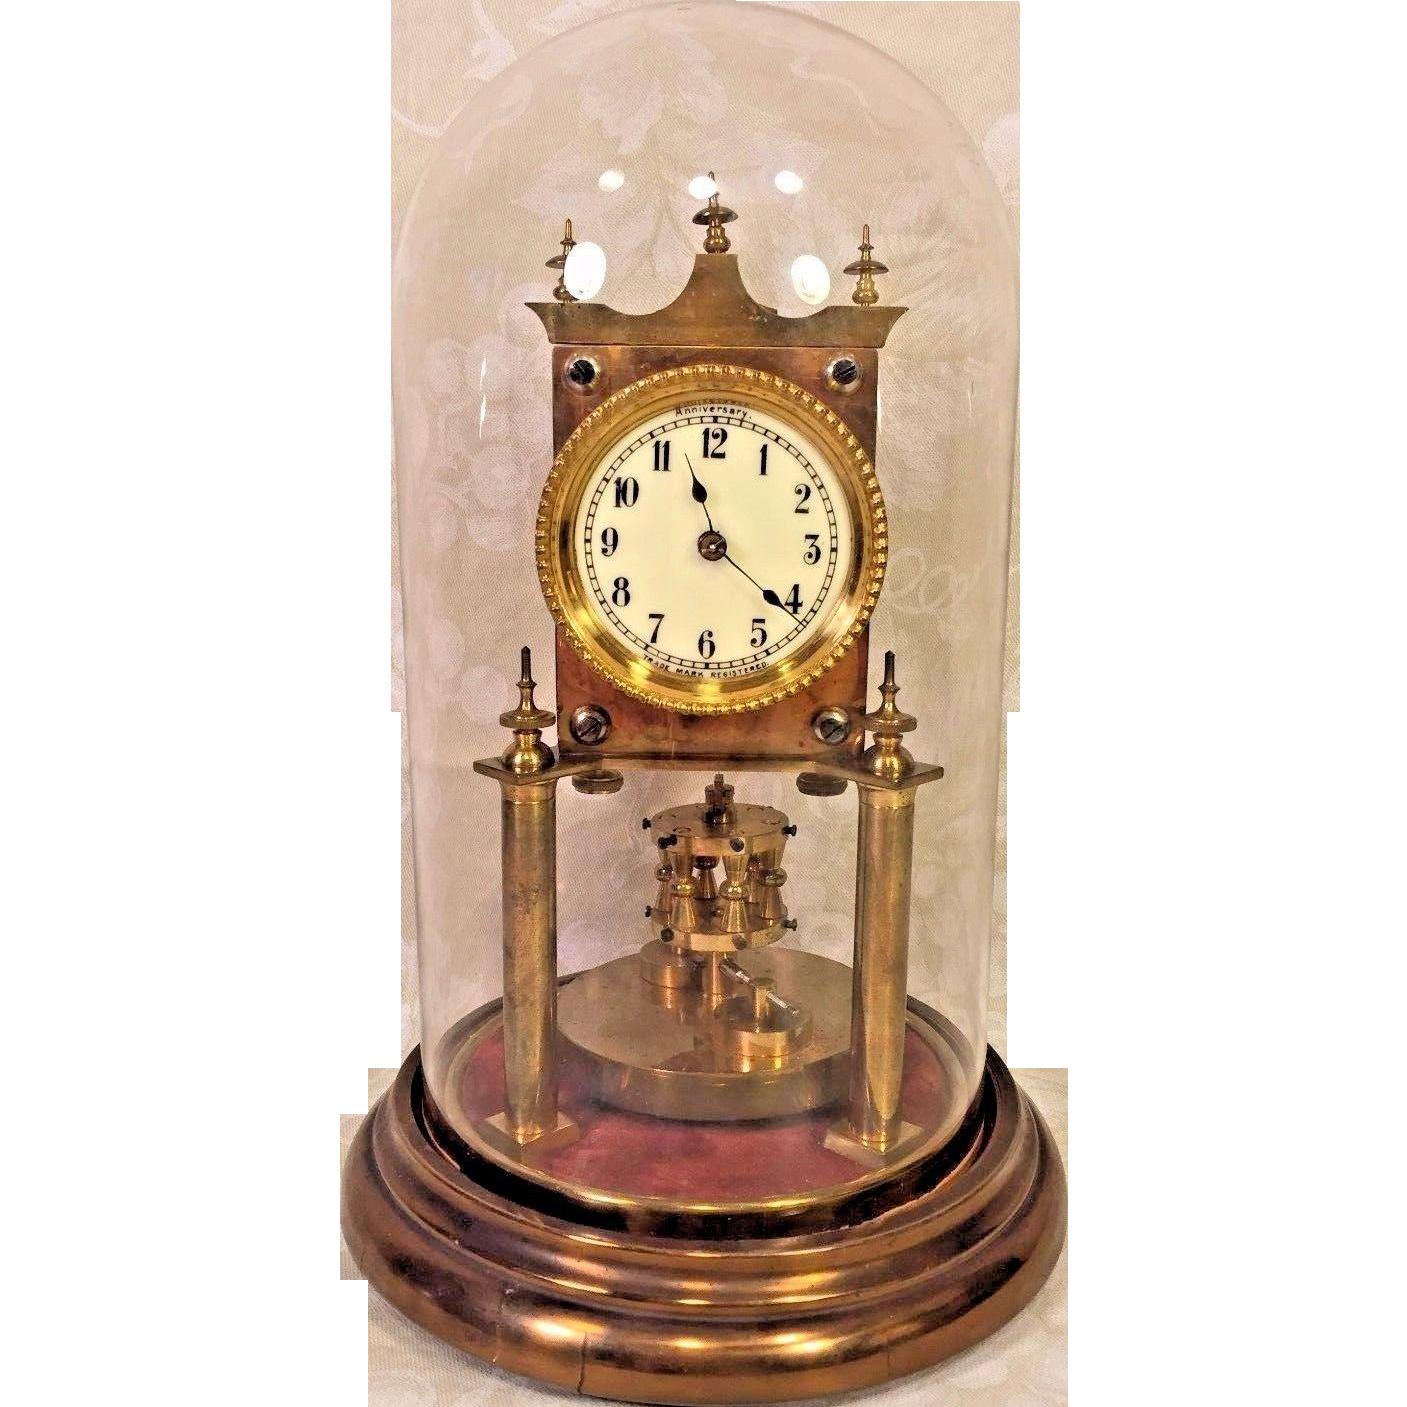 torsion pendulum clock. antique german 400 day clock torsion pendulum running nice glass dome porcelain face 1920s a